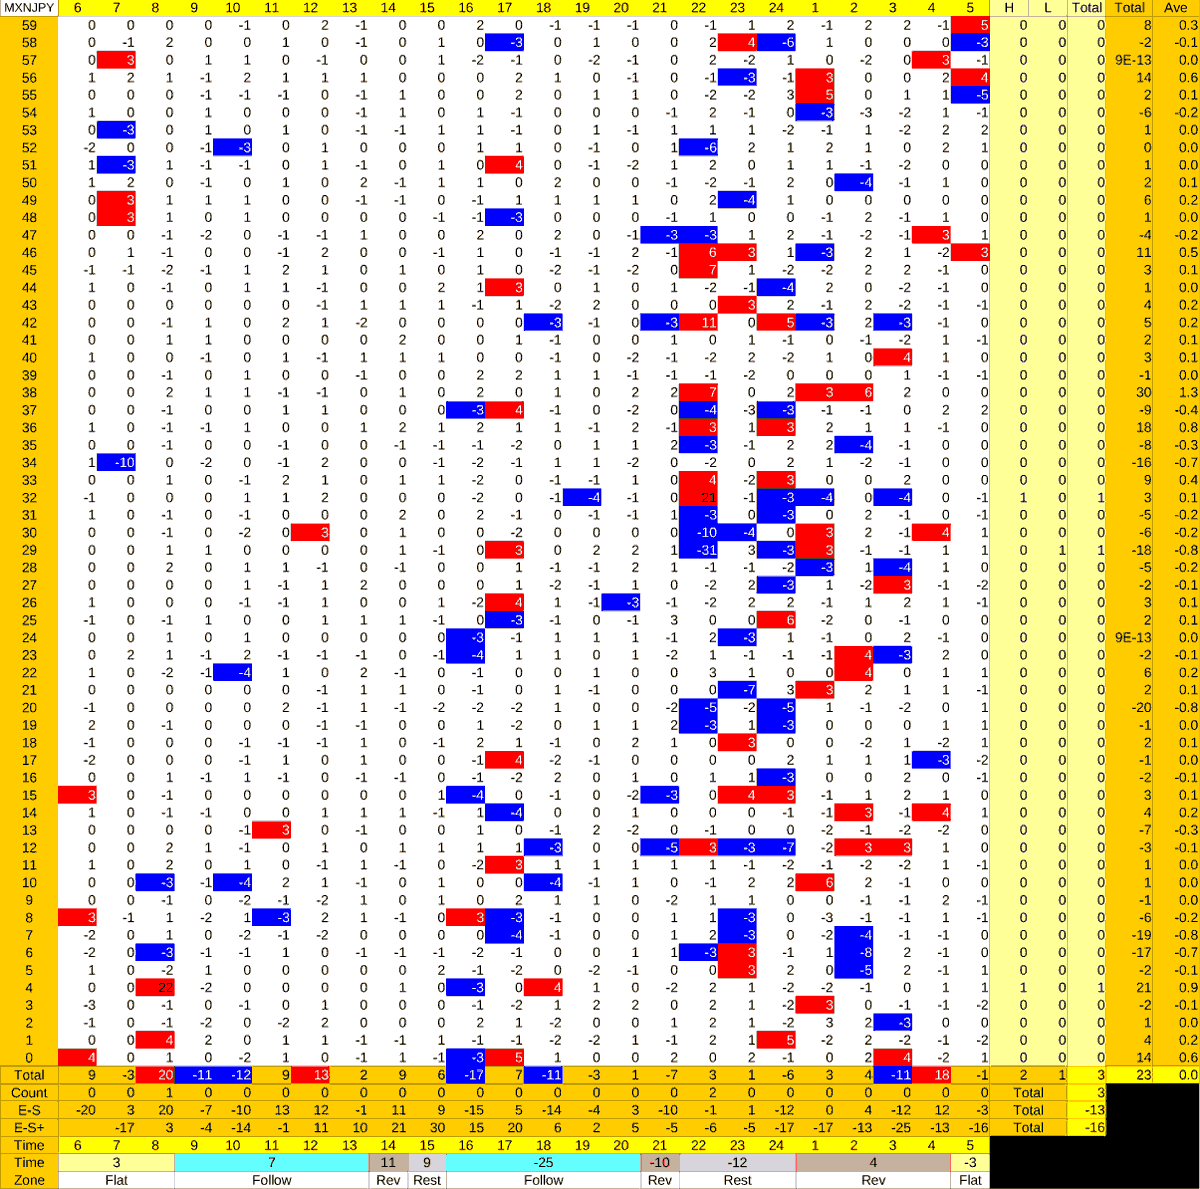 20210305_HS(3)MXNJPY